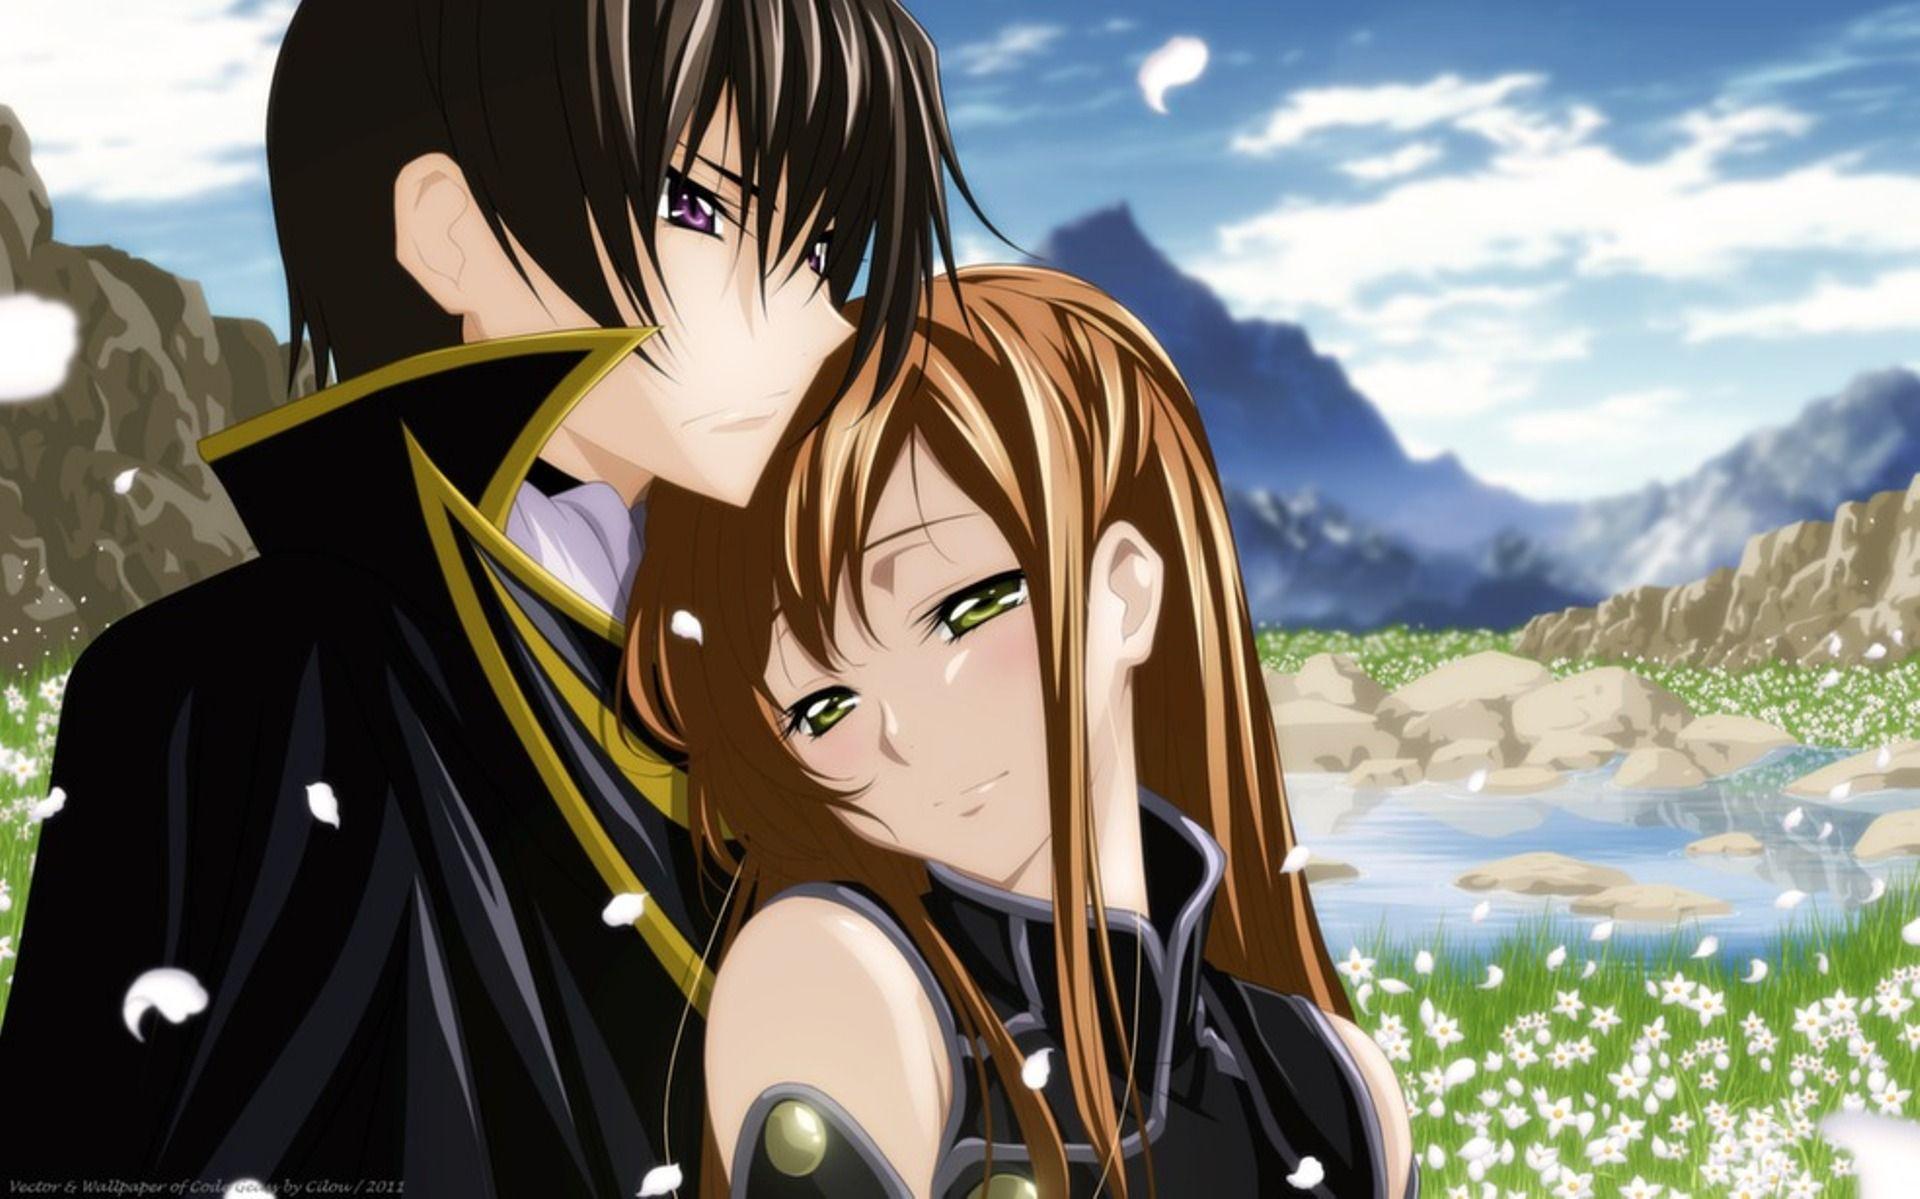 76 ] Romantic Anime Wallpapers On WallpaperSafari